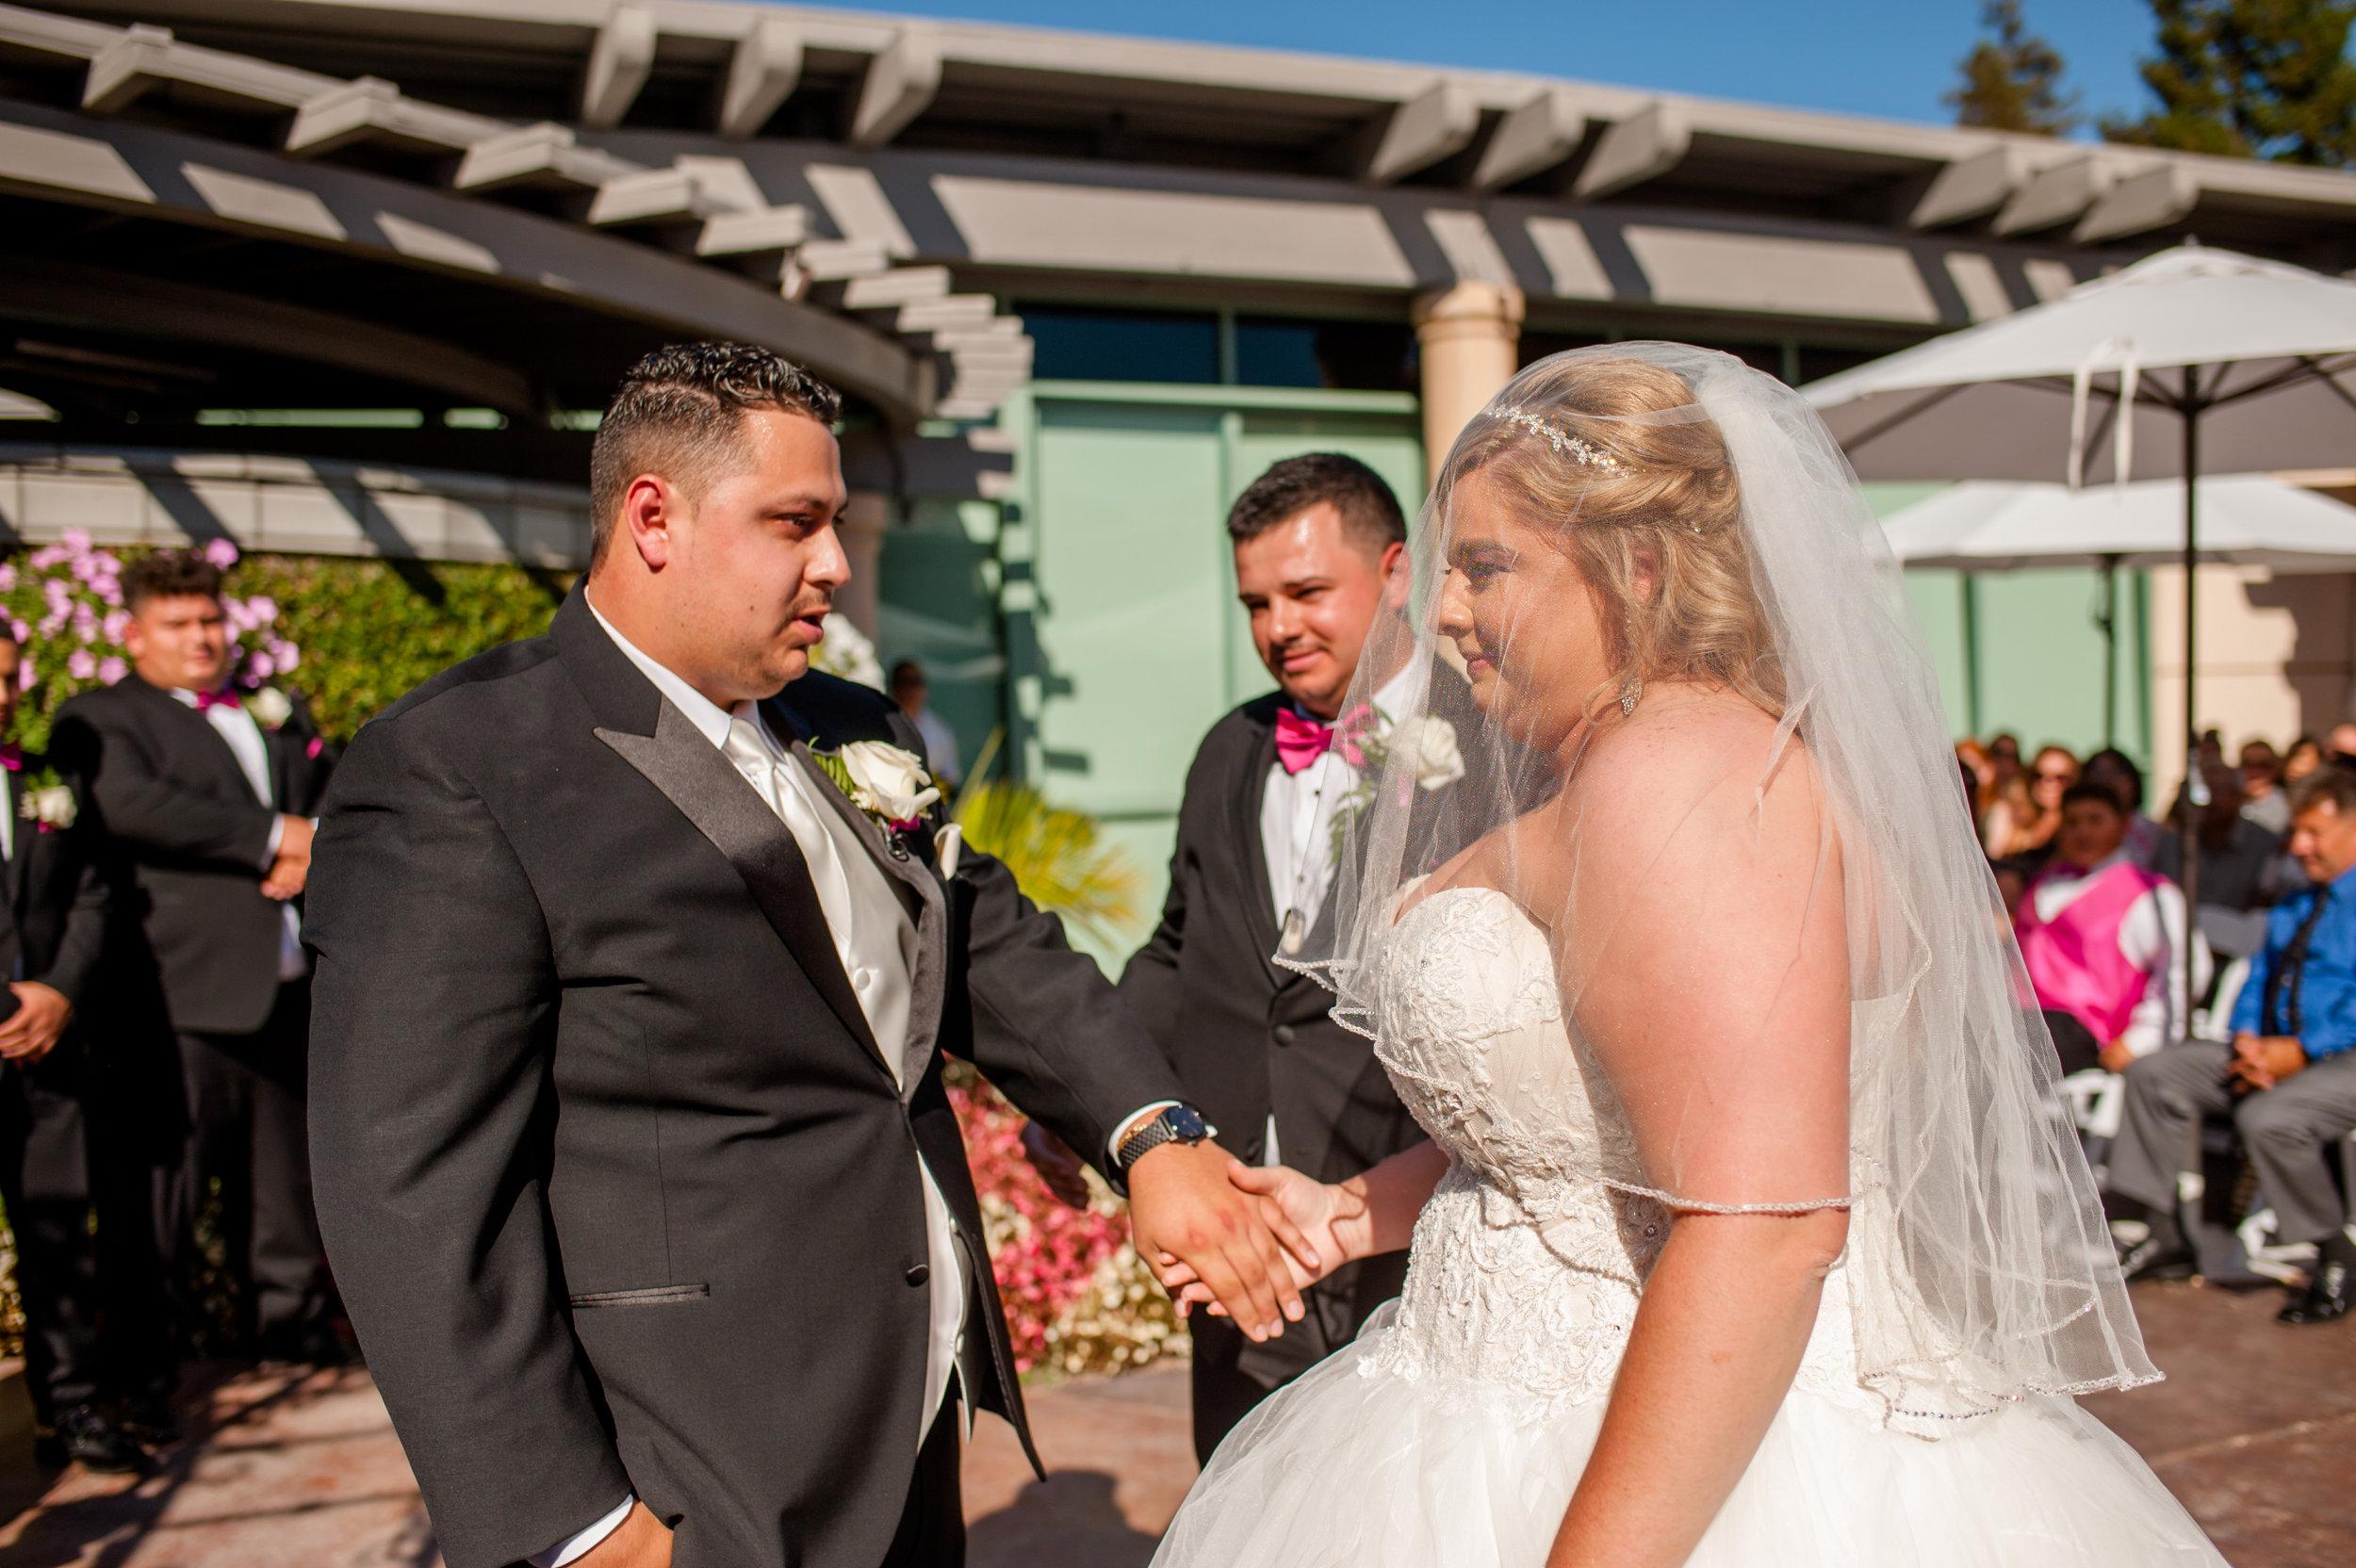 lyndzie-javier-015-arden-hills-sacramento-wedding-photographer-katherine-nicole-photography.JPG